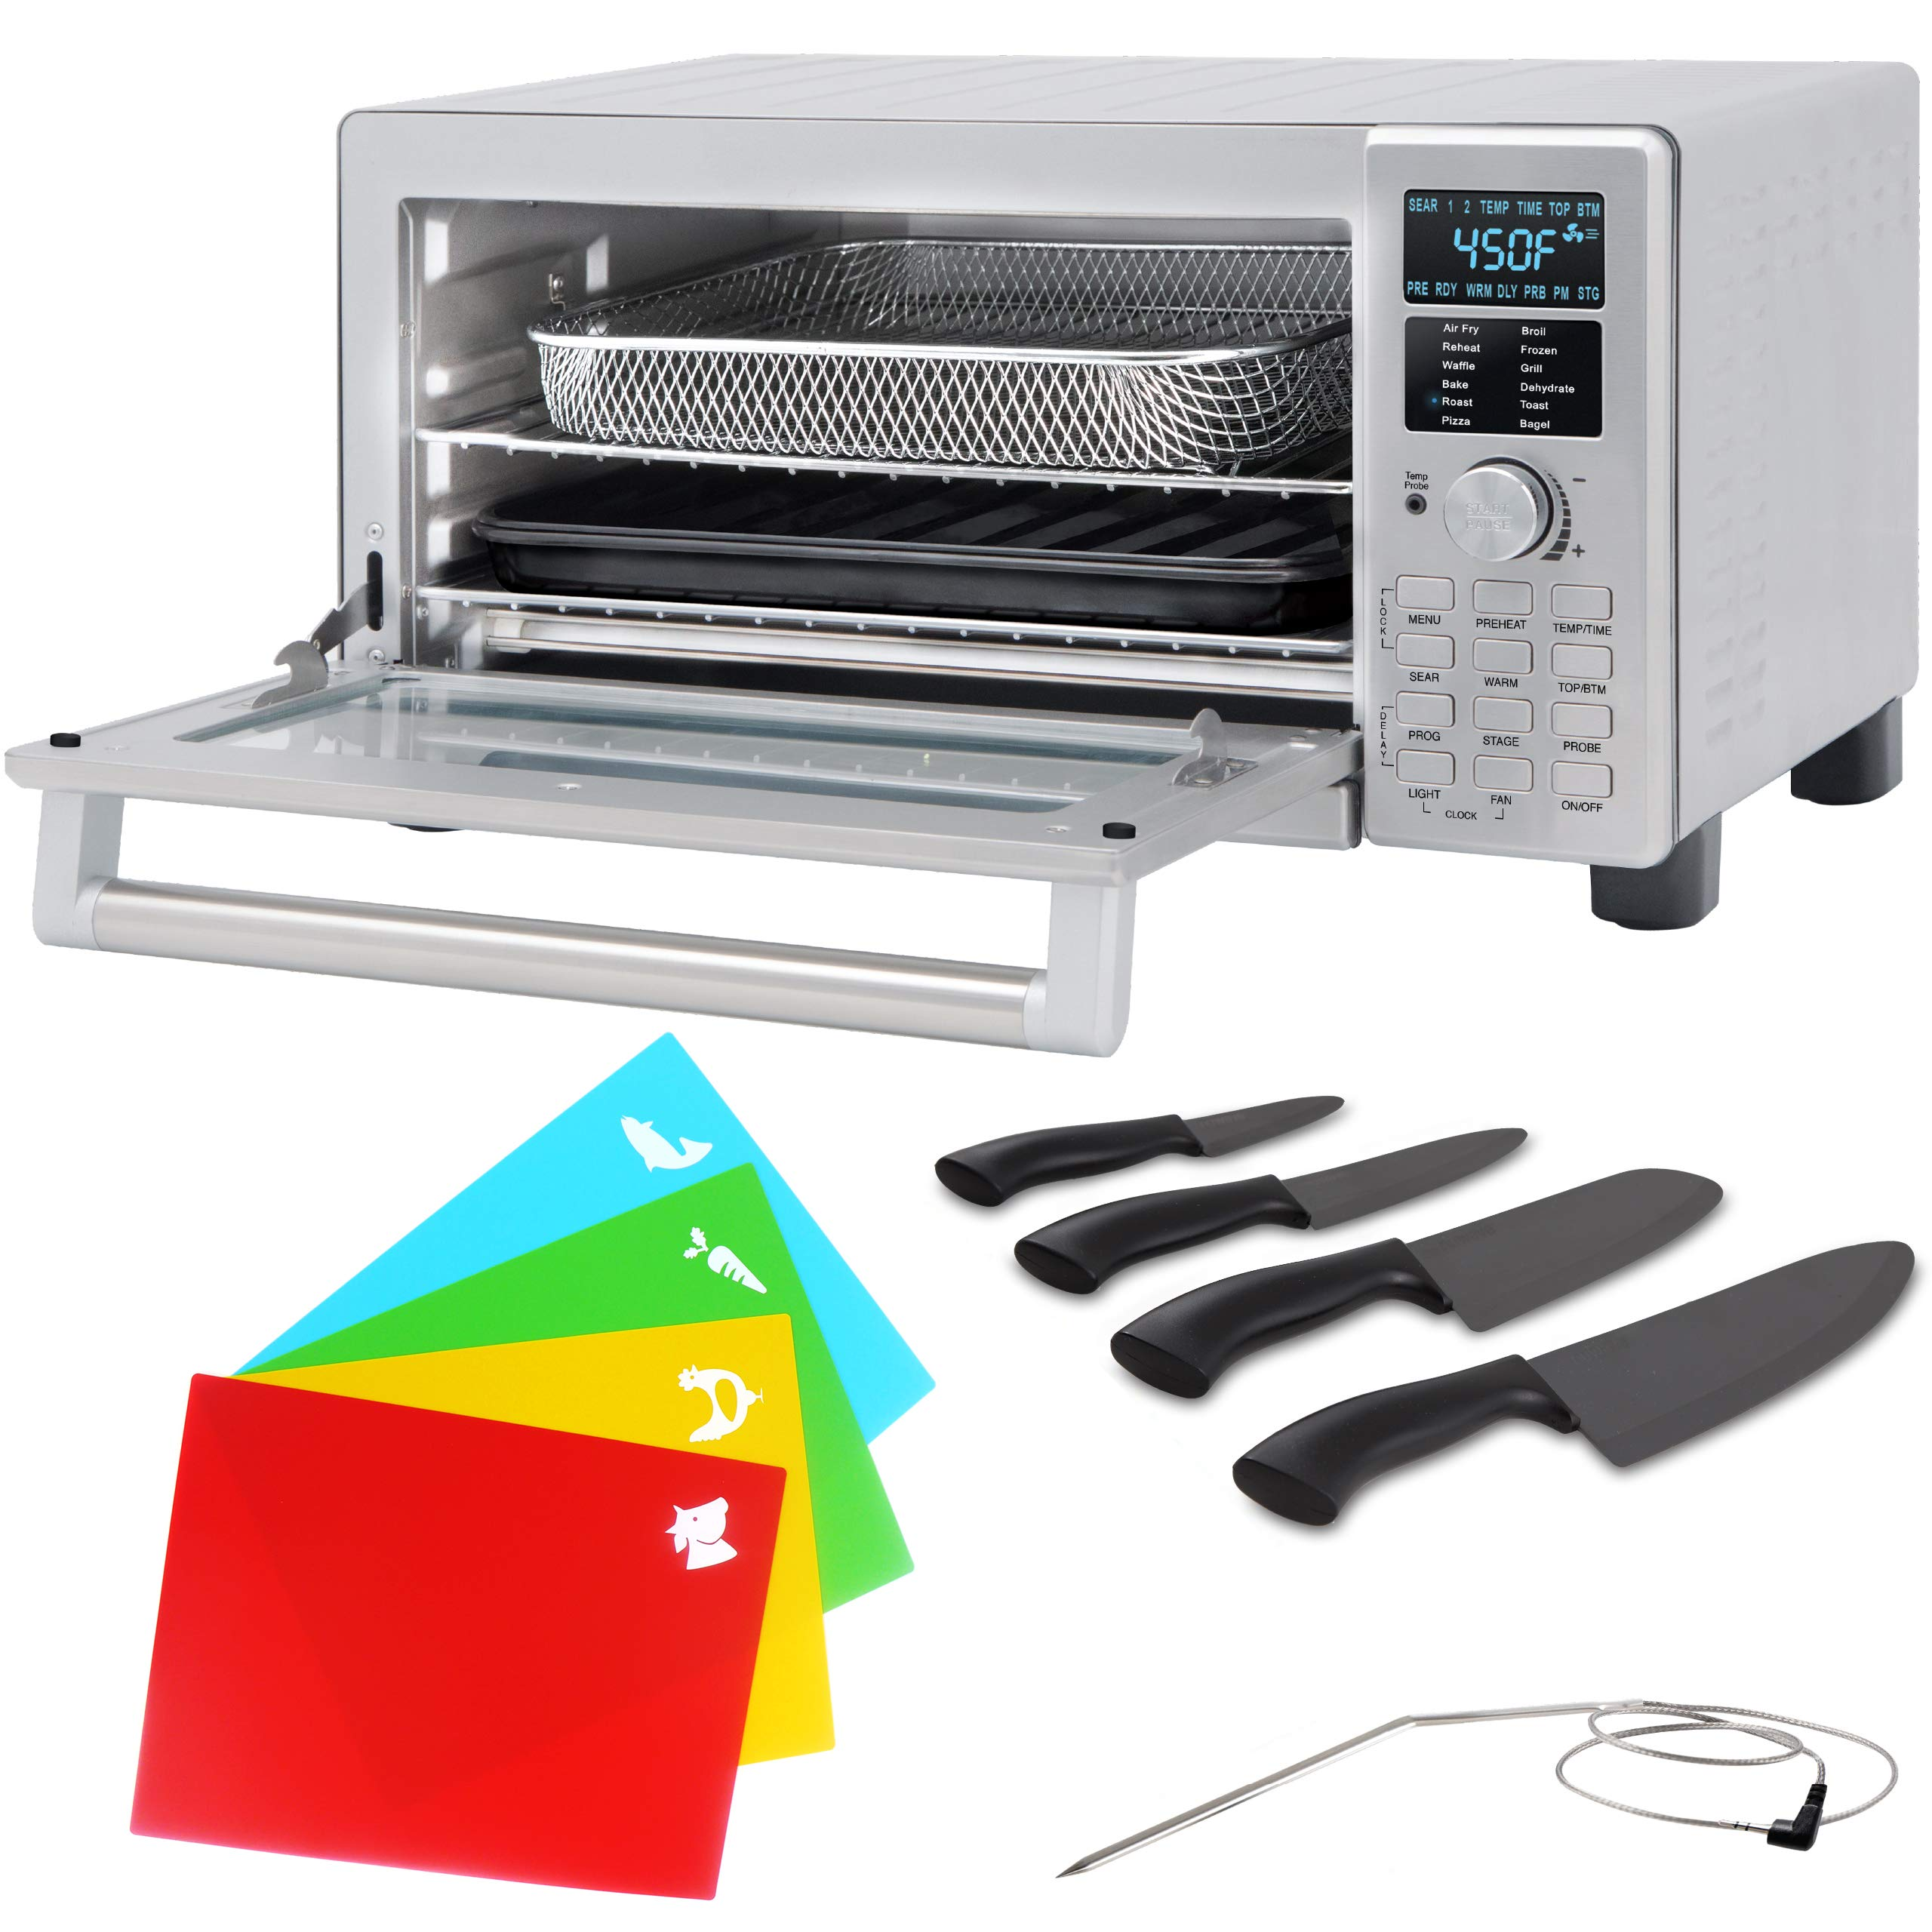 NUWAVE Bravo XL 1800-watt Smart Air Fryer Convection Oven with Integrated Digital Temperature Probe, 4-piece Ceramic Knife Set and Flex-Mats